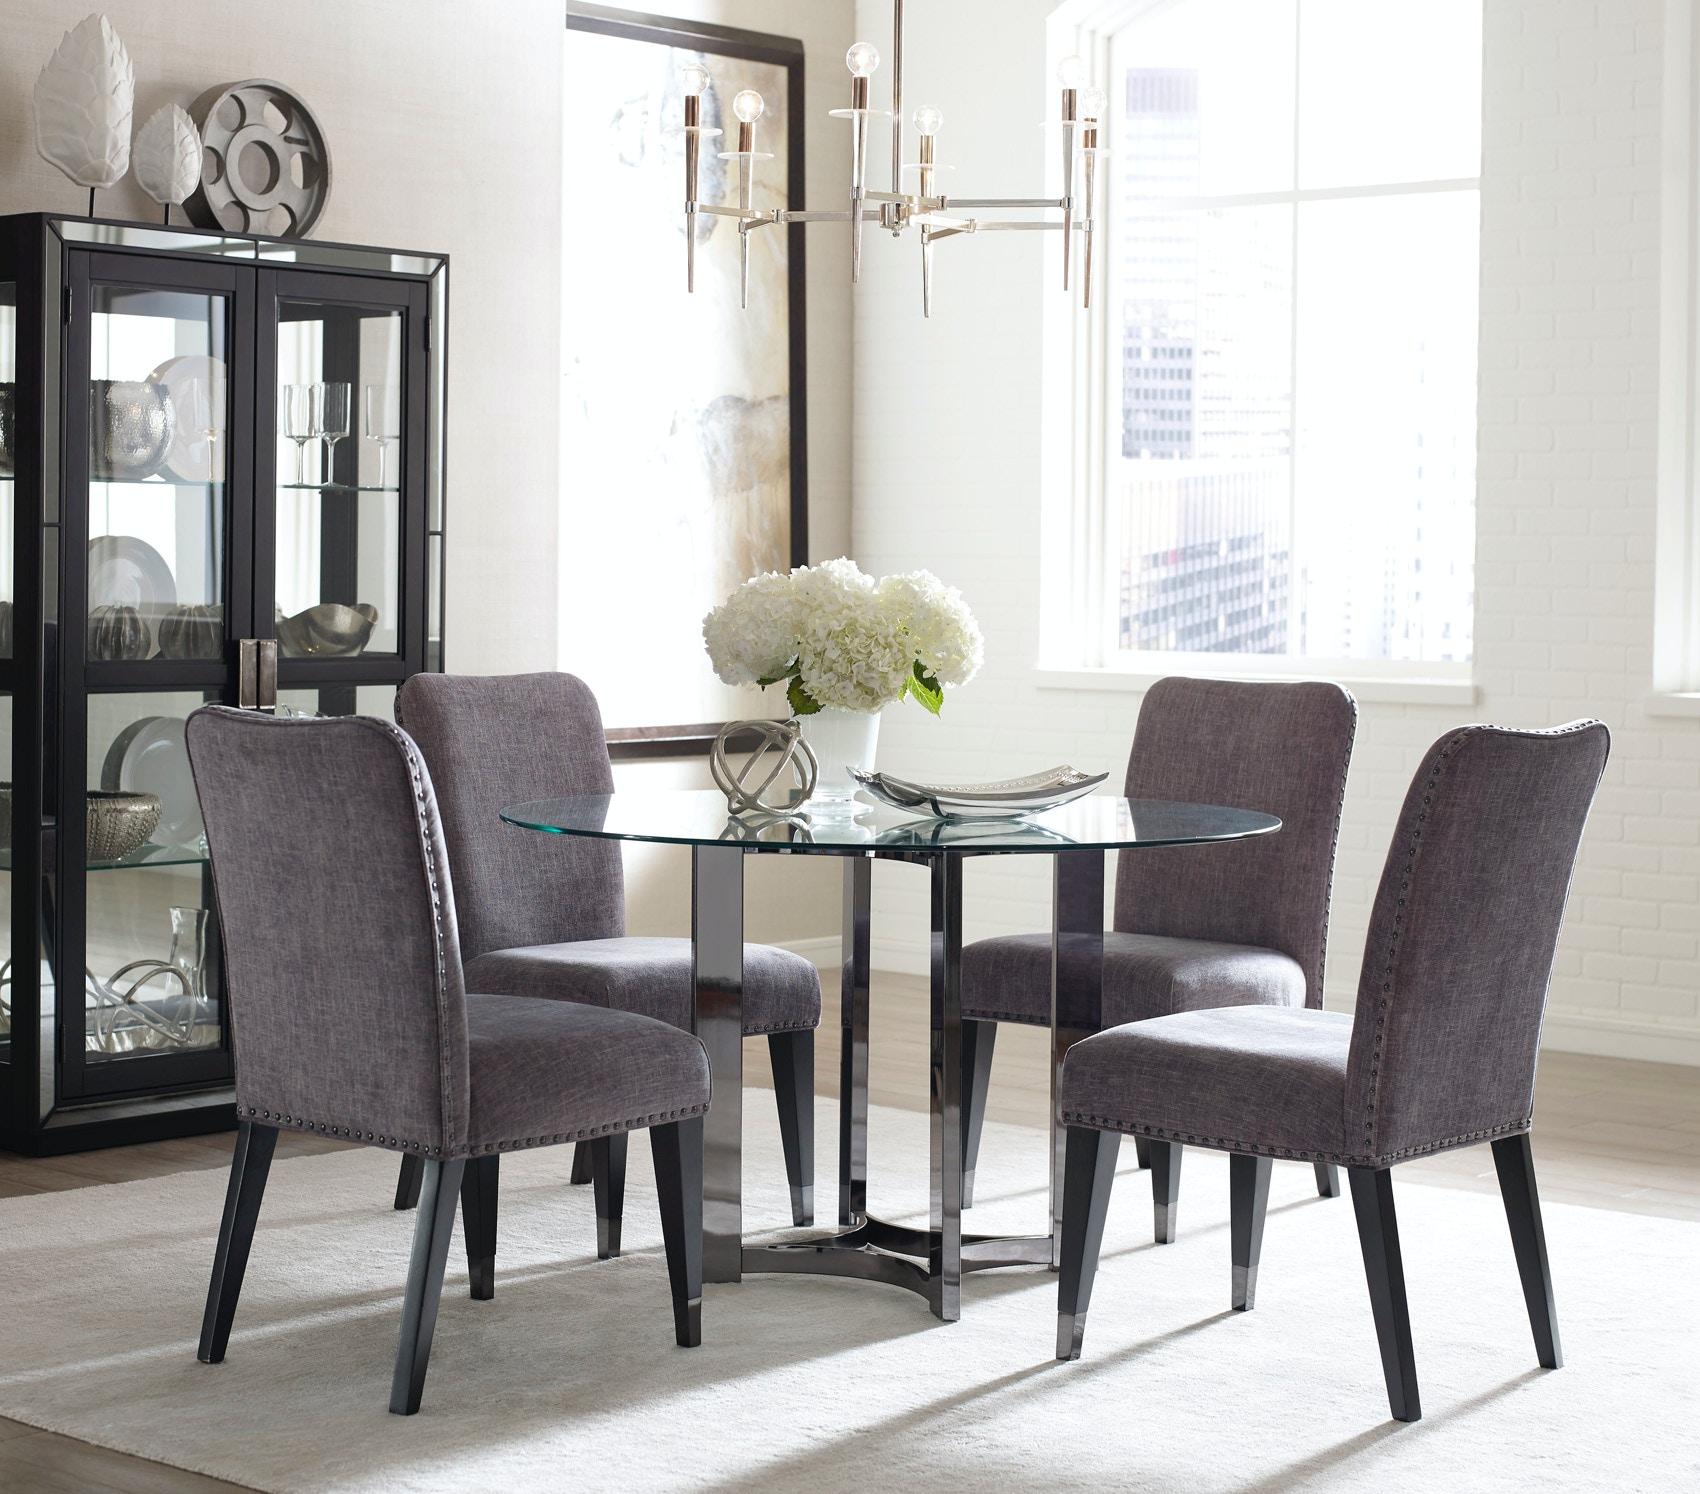 pulaski furniture dining room silverton sound round dining set pulaski furniture silverton sound round dining set 510903 click to zoom